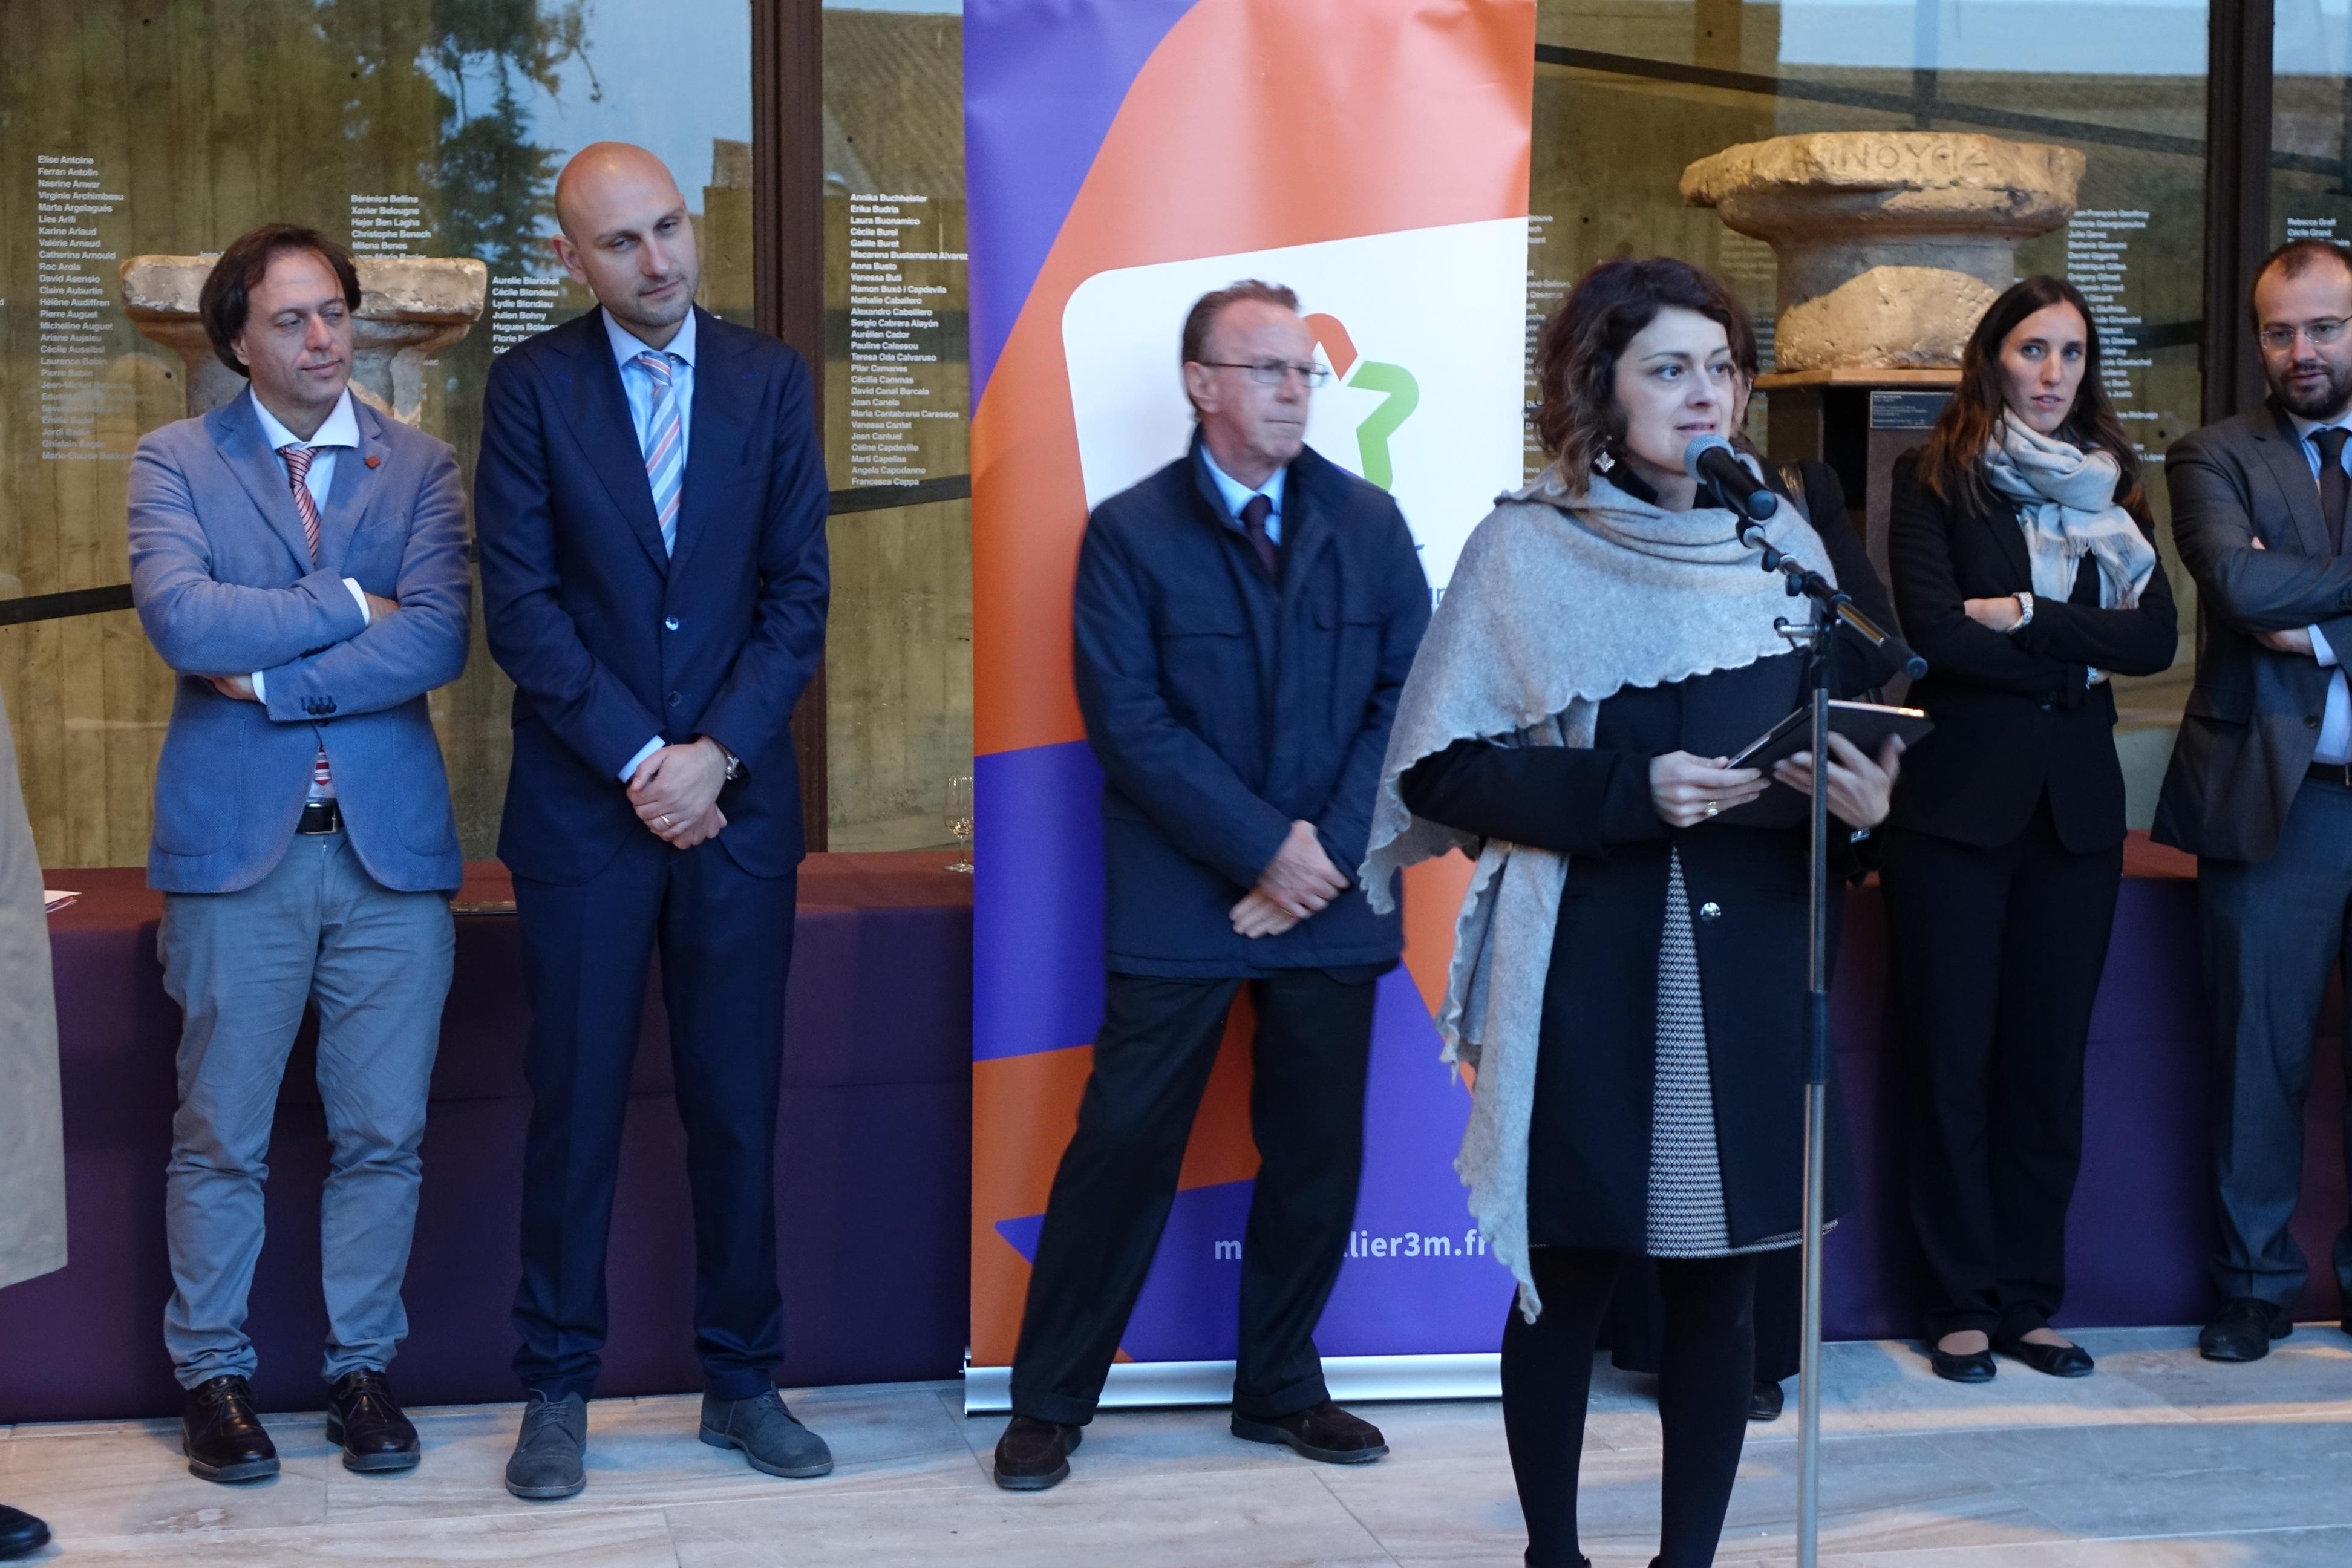 La Mostra 'Gli Etruschi maestri di scrittura' inaugurata a Lattes